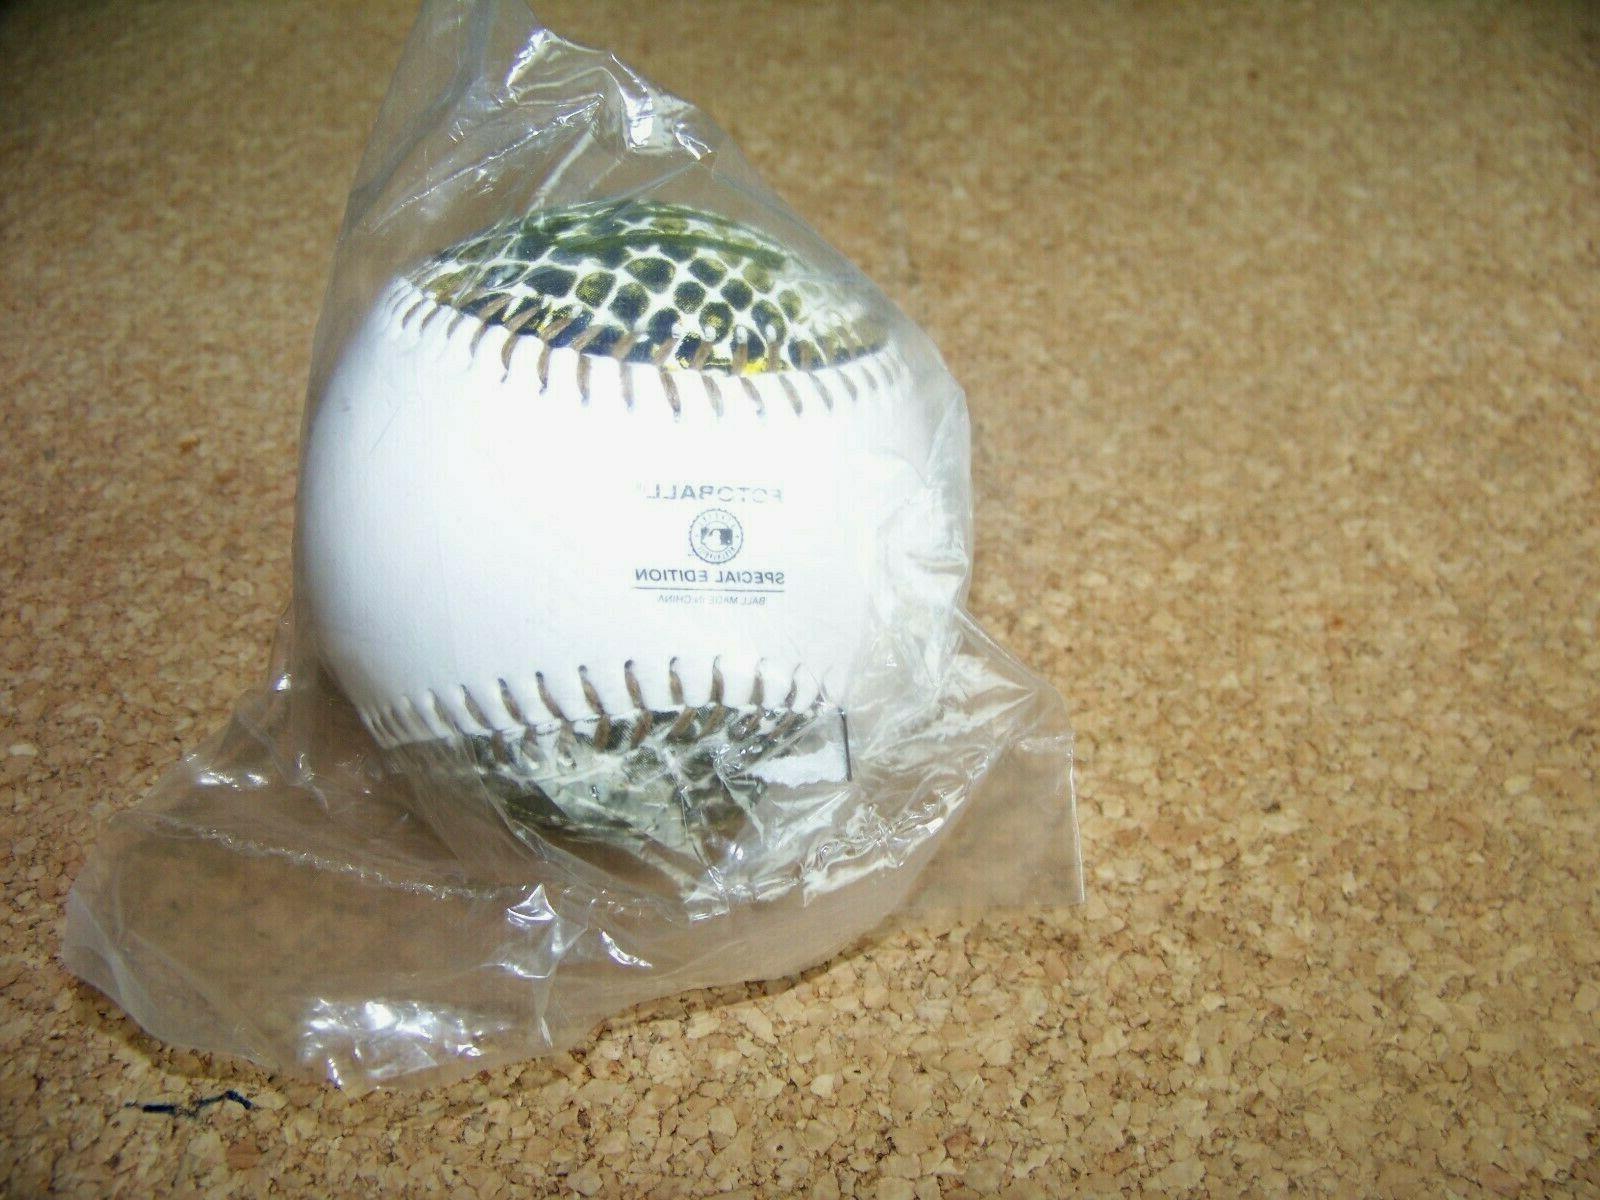 1998 Inaugural Diamondbacks baseball ball